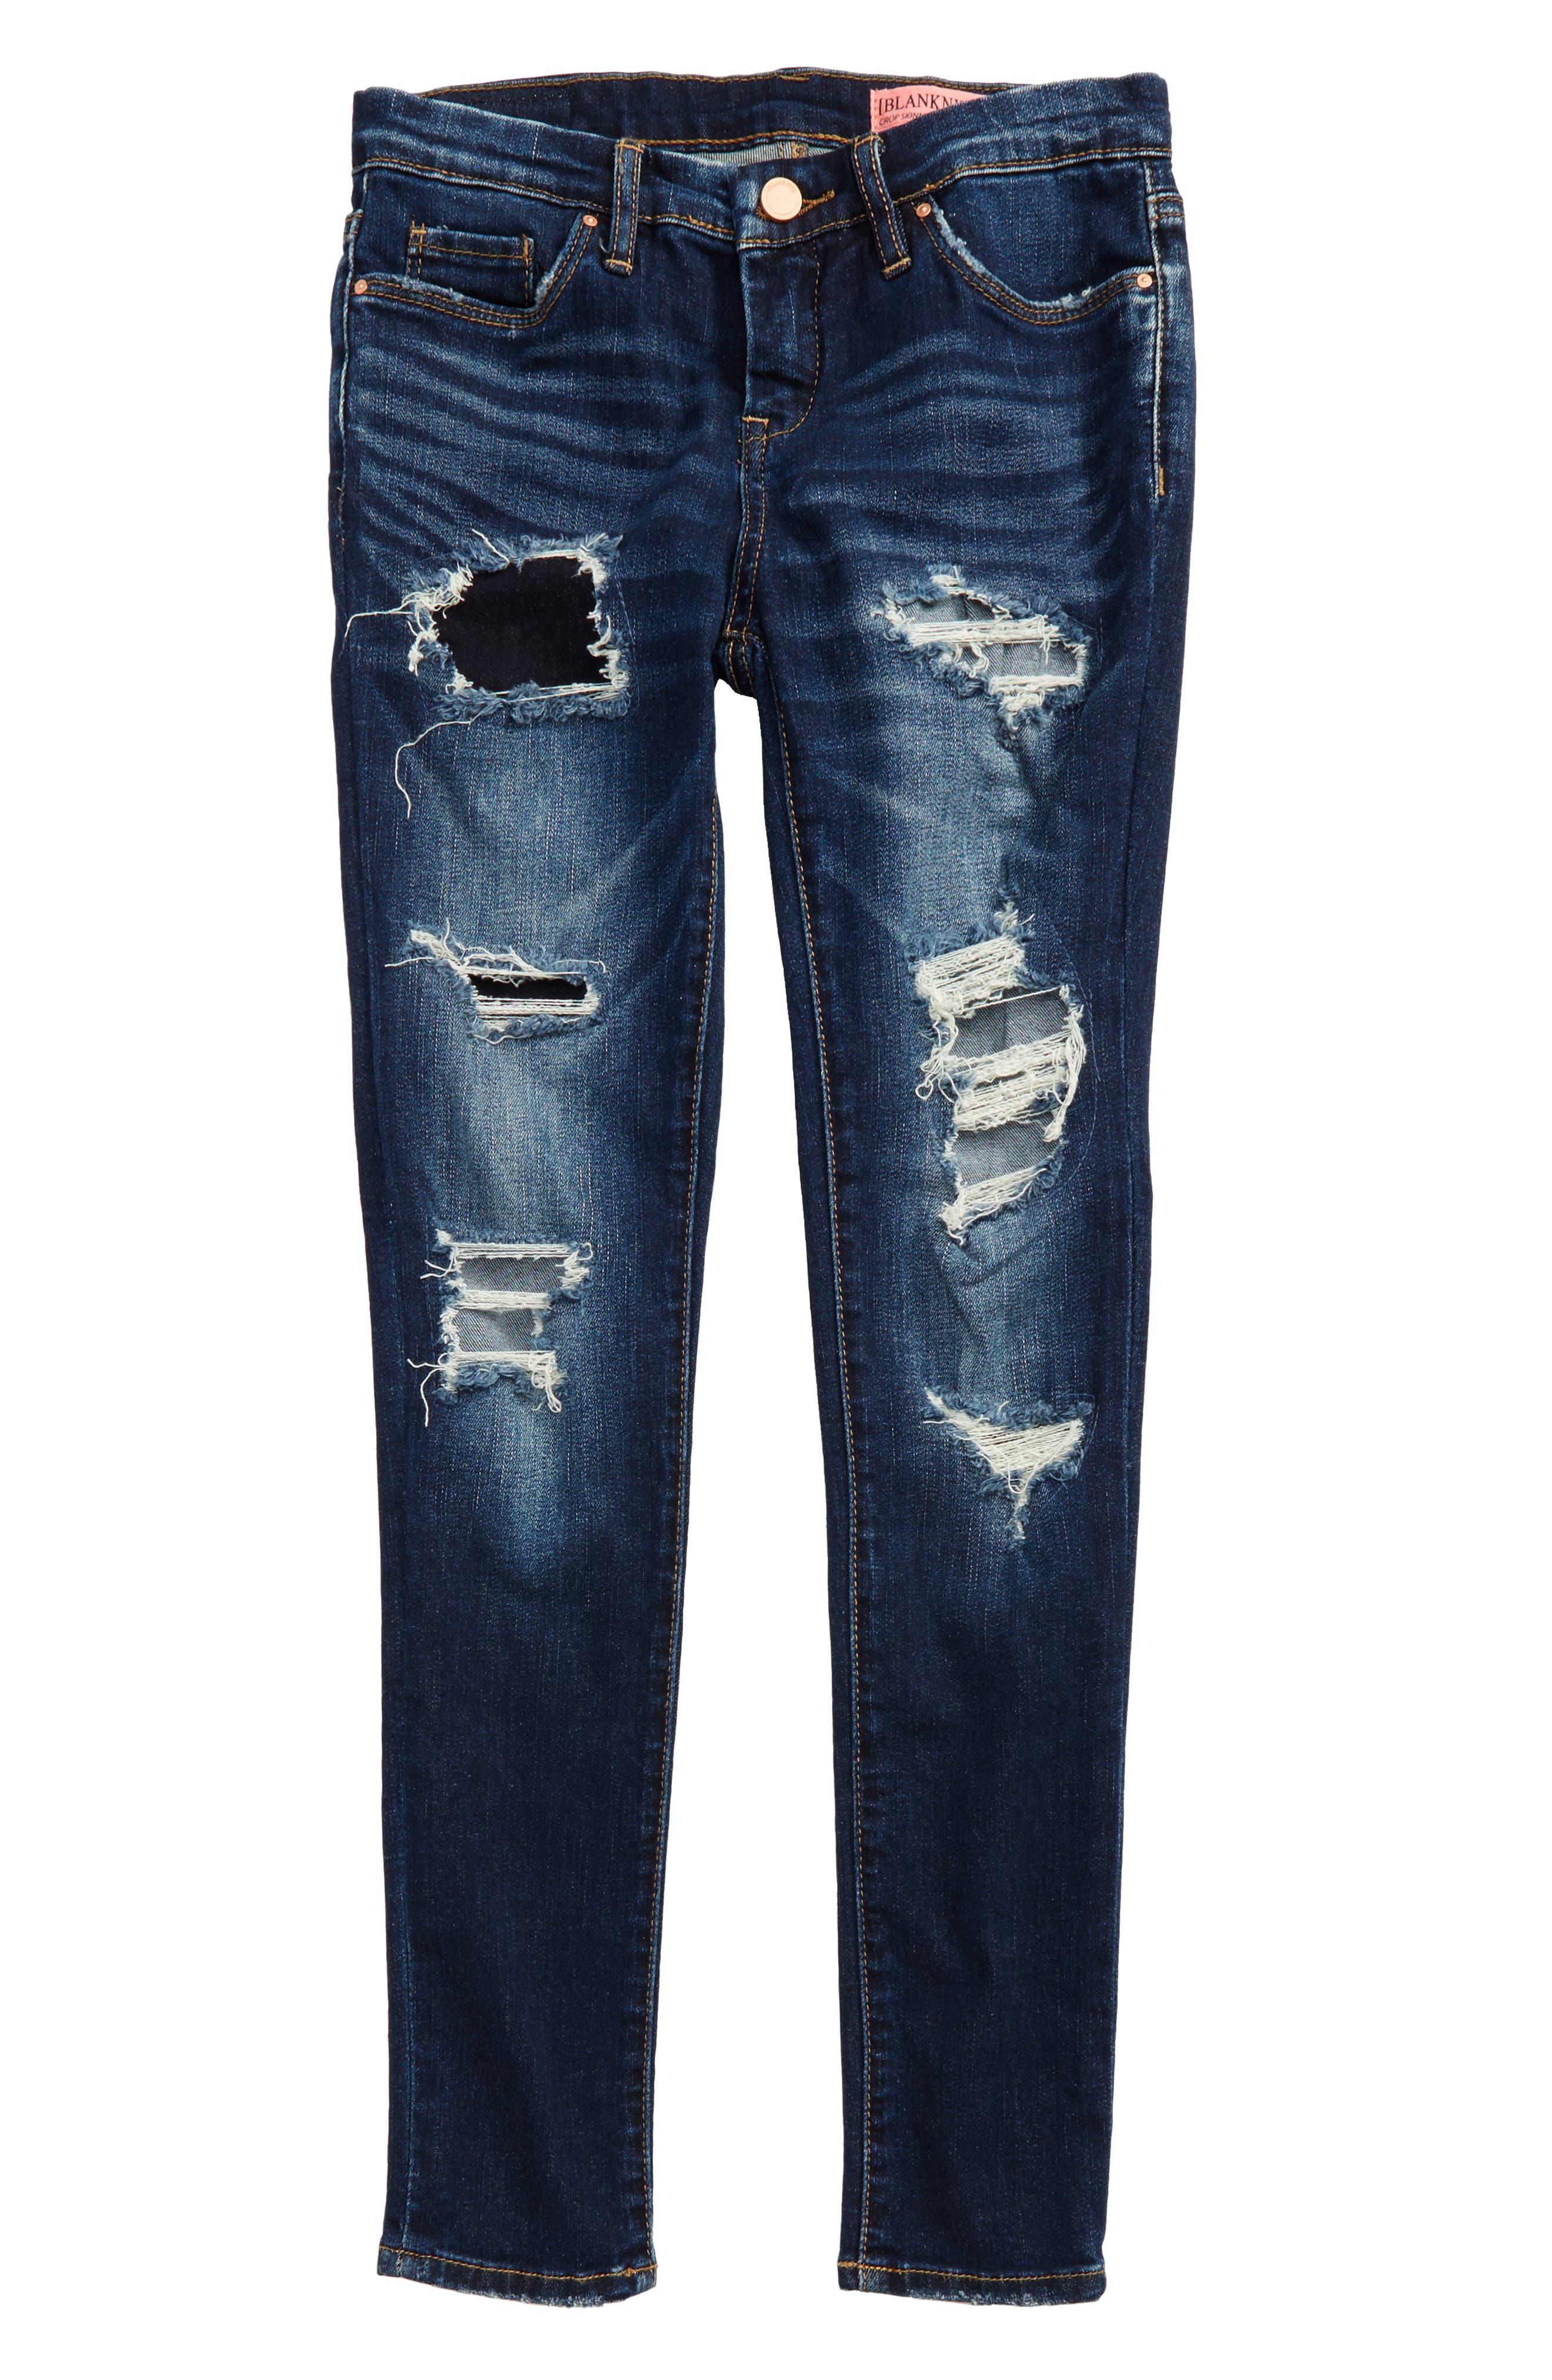 Main Image - BLANKNYC Rip & Repair Skinny Jeans (Big Girls)